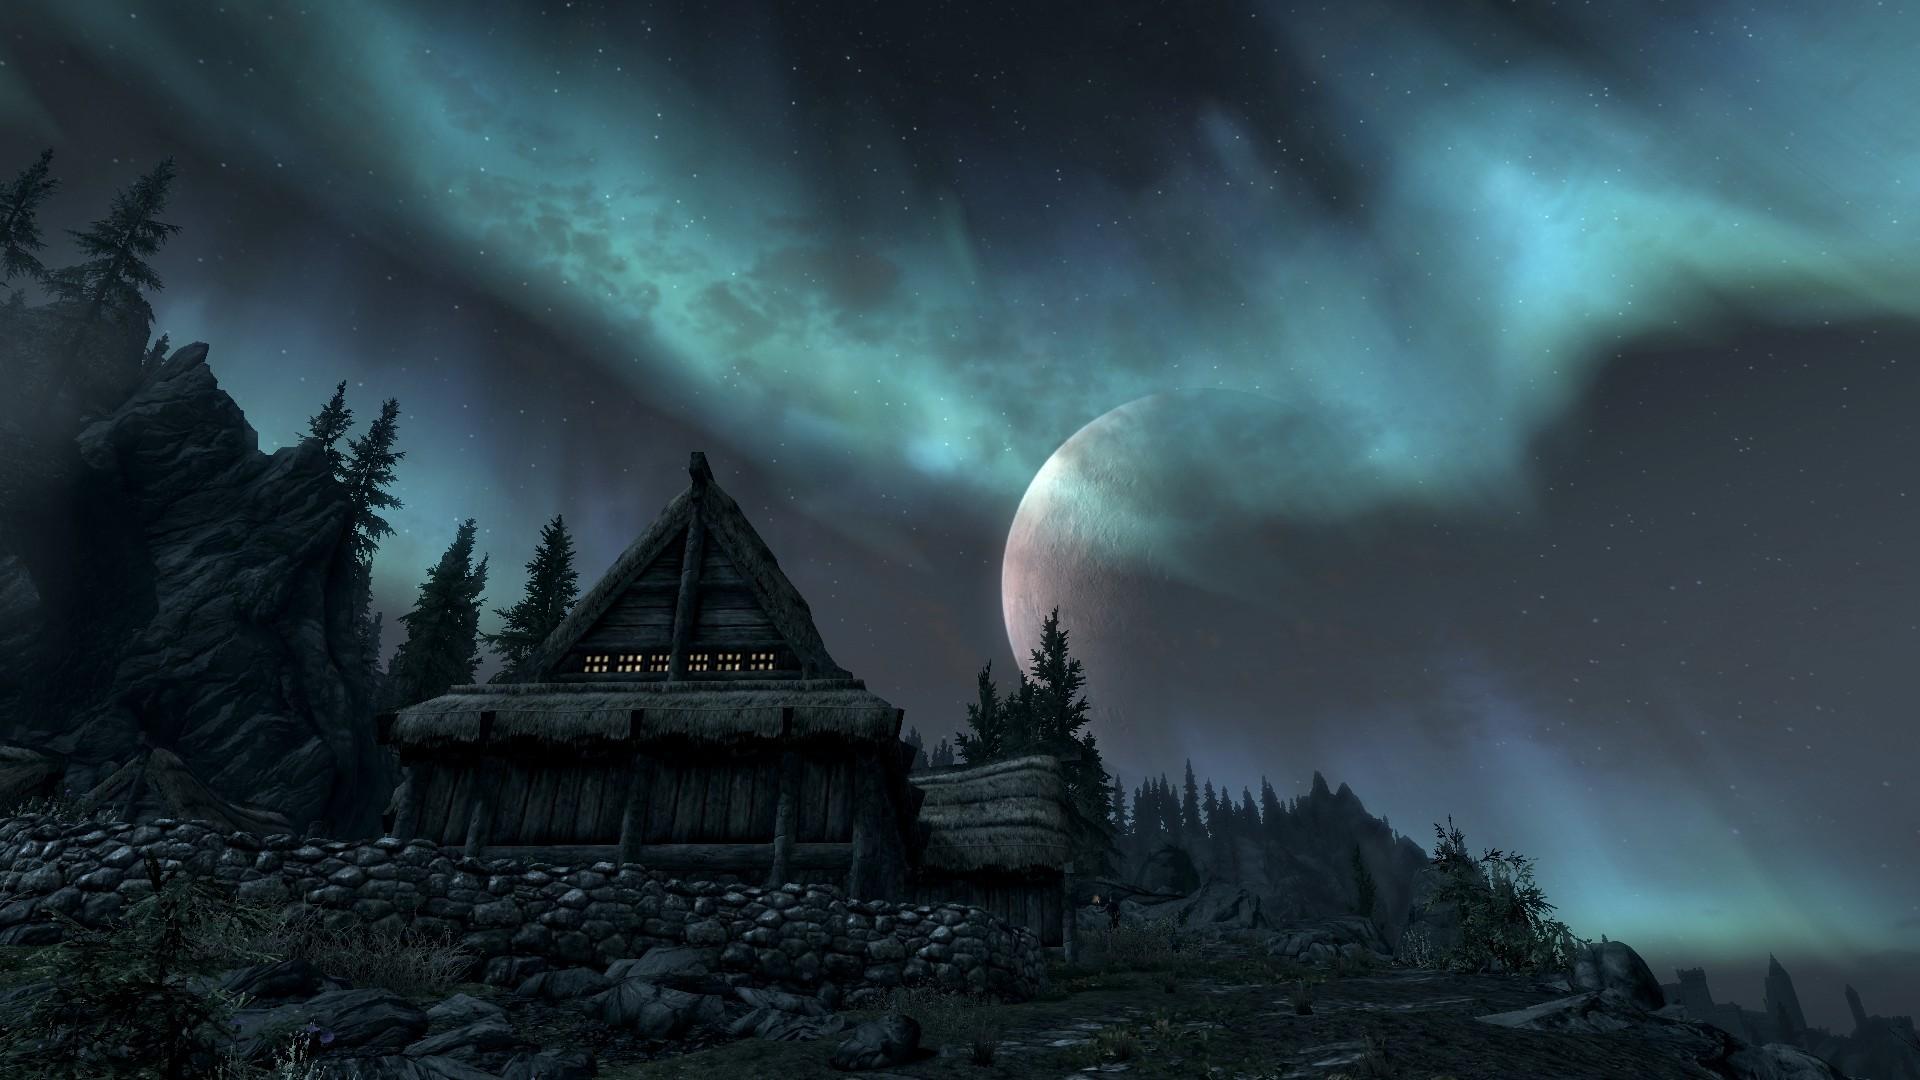 Elder Scrolls V Skyrim Wallpaper (79+ images)